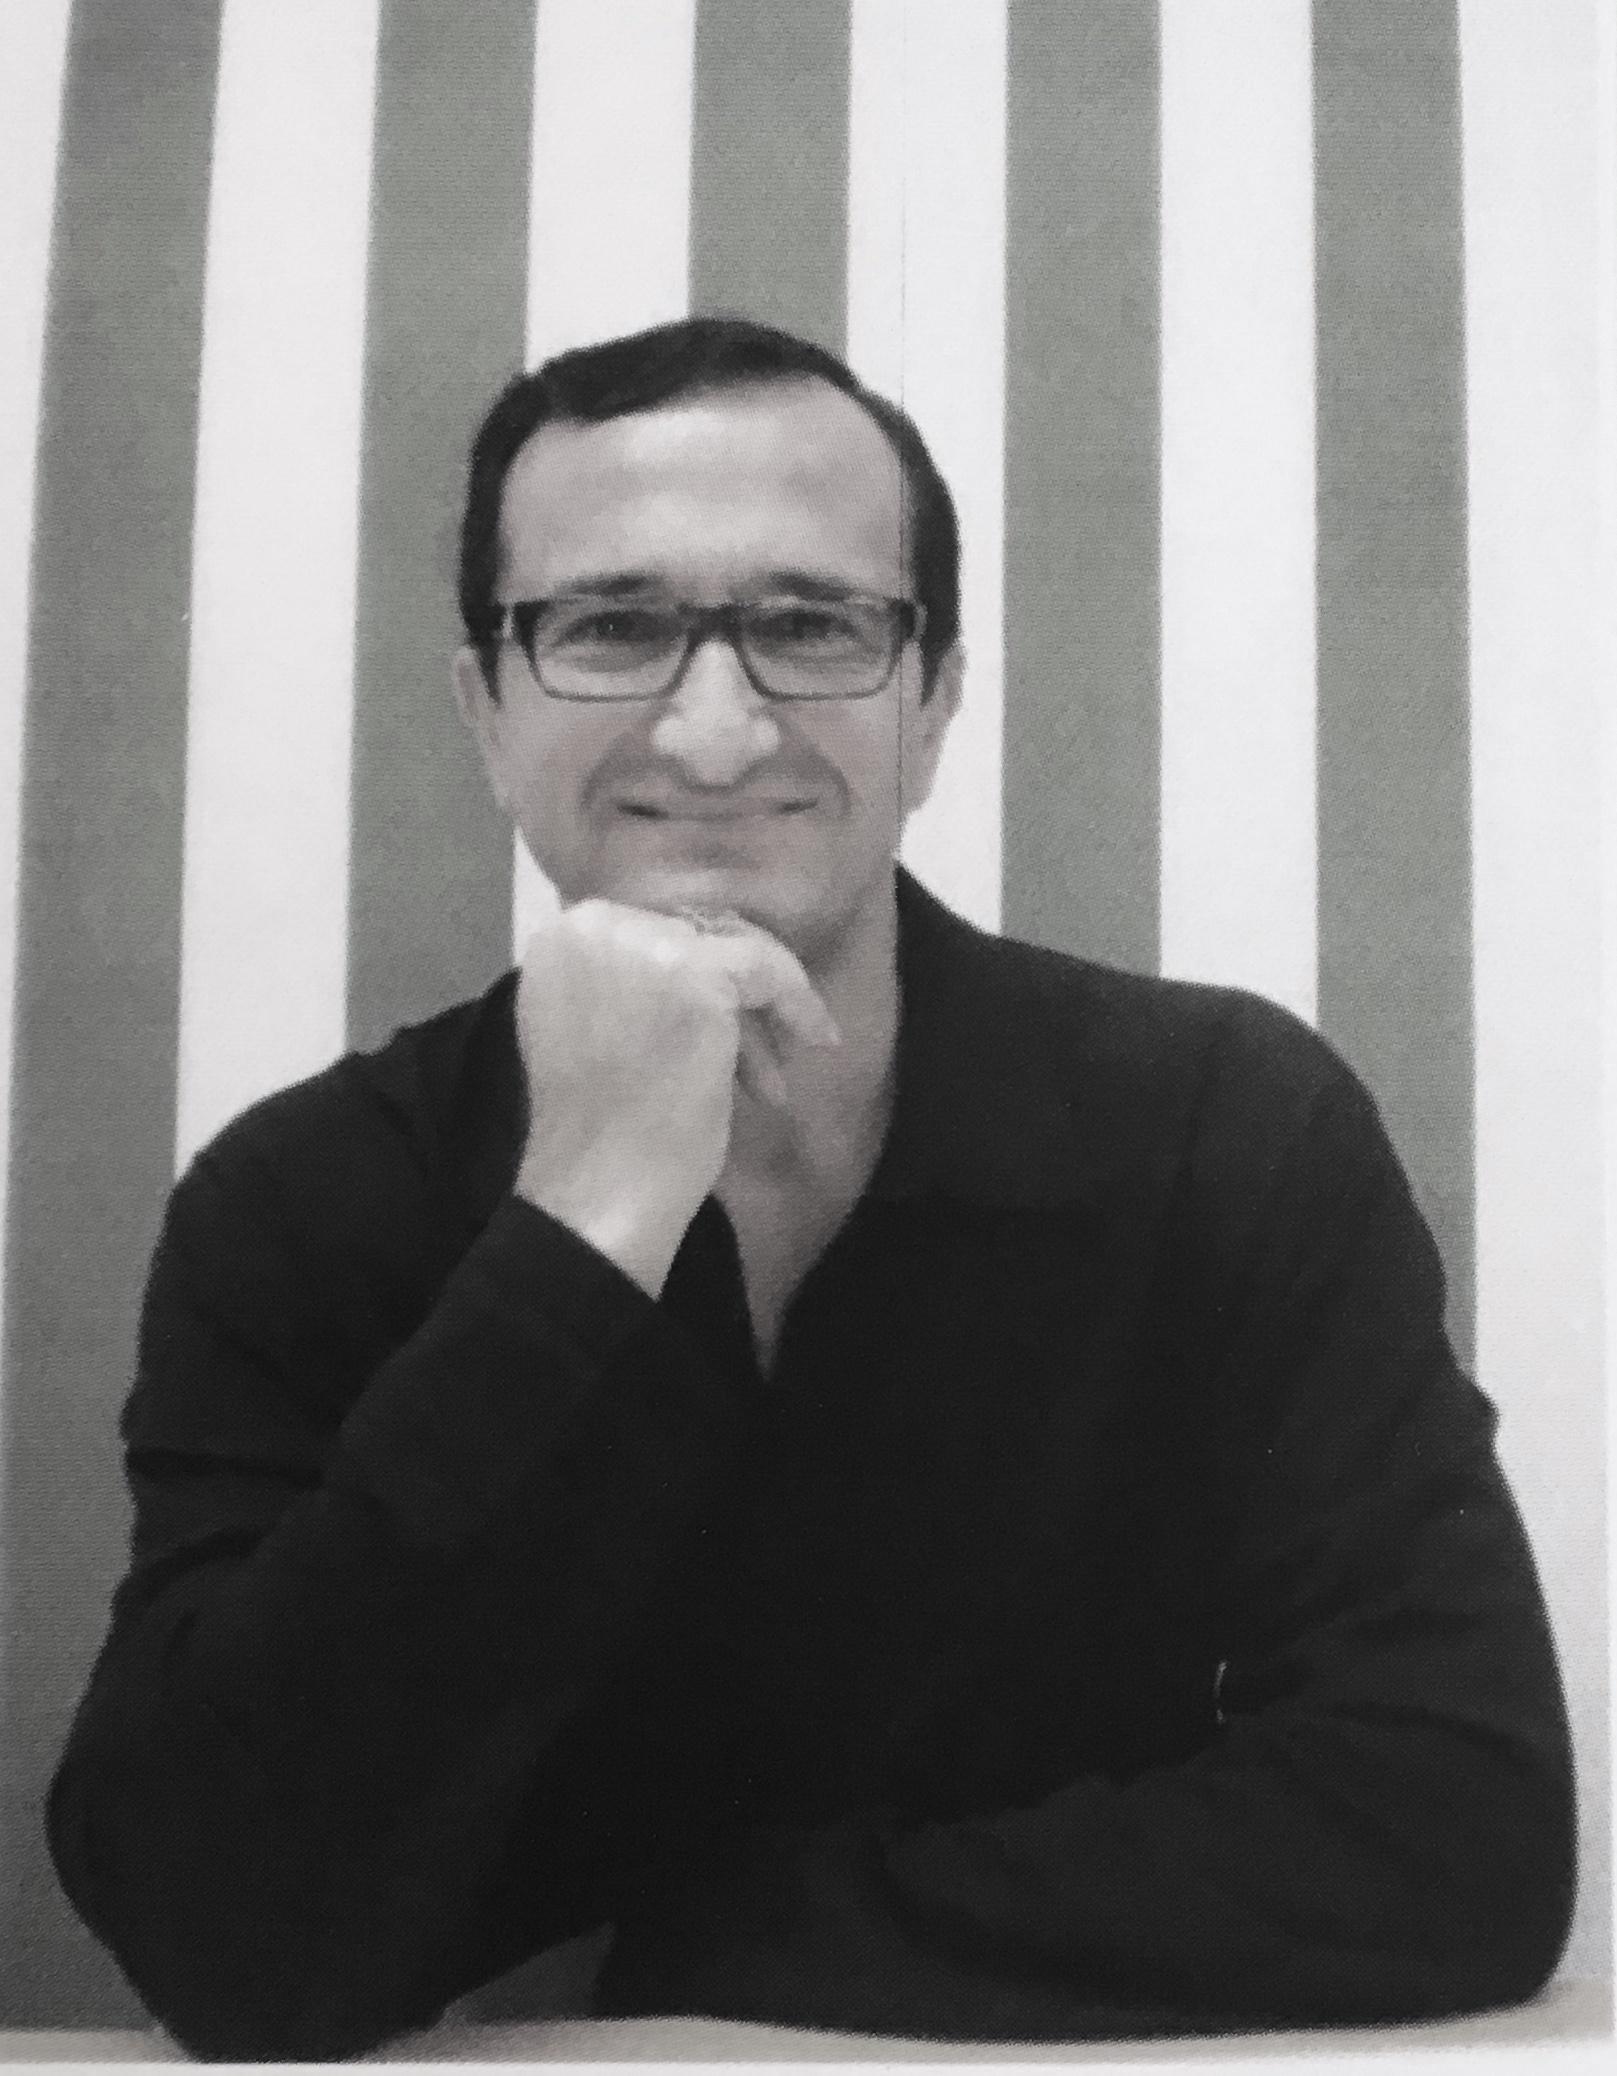 Vito Shakaj